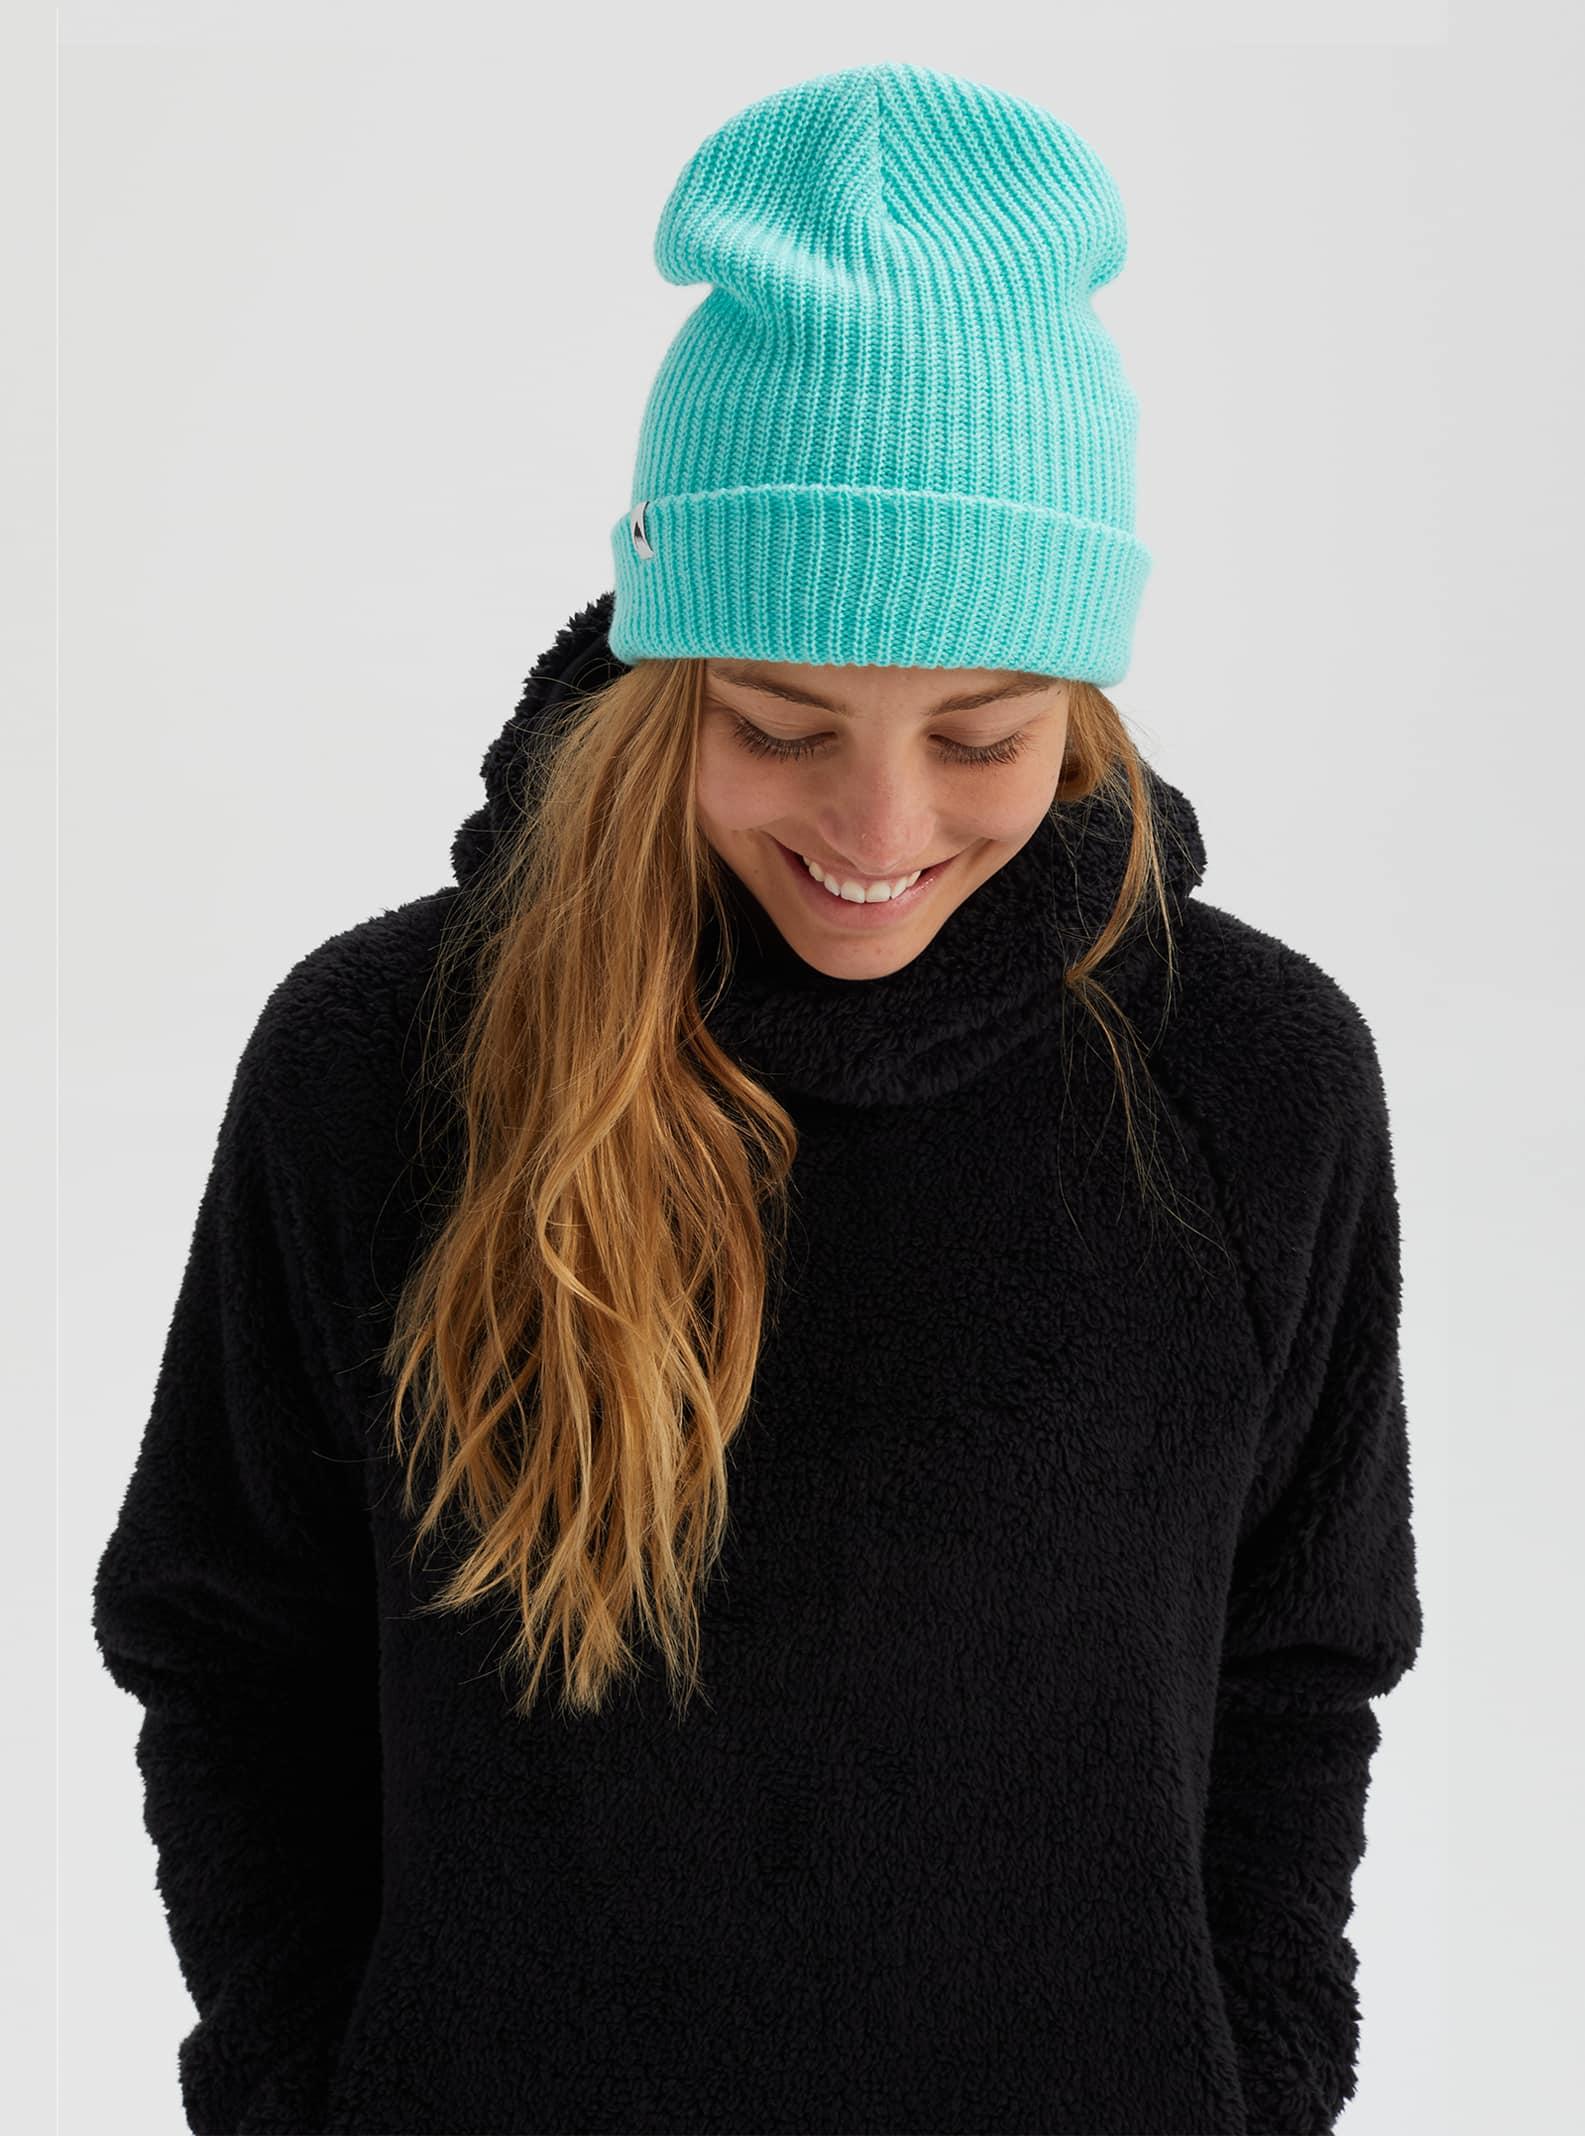 af0905735e05d1 Men's Hats & Beanies | Burton Snowboards